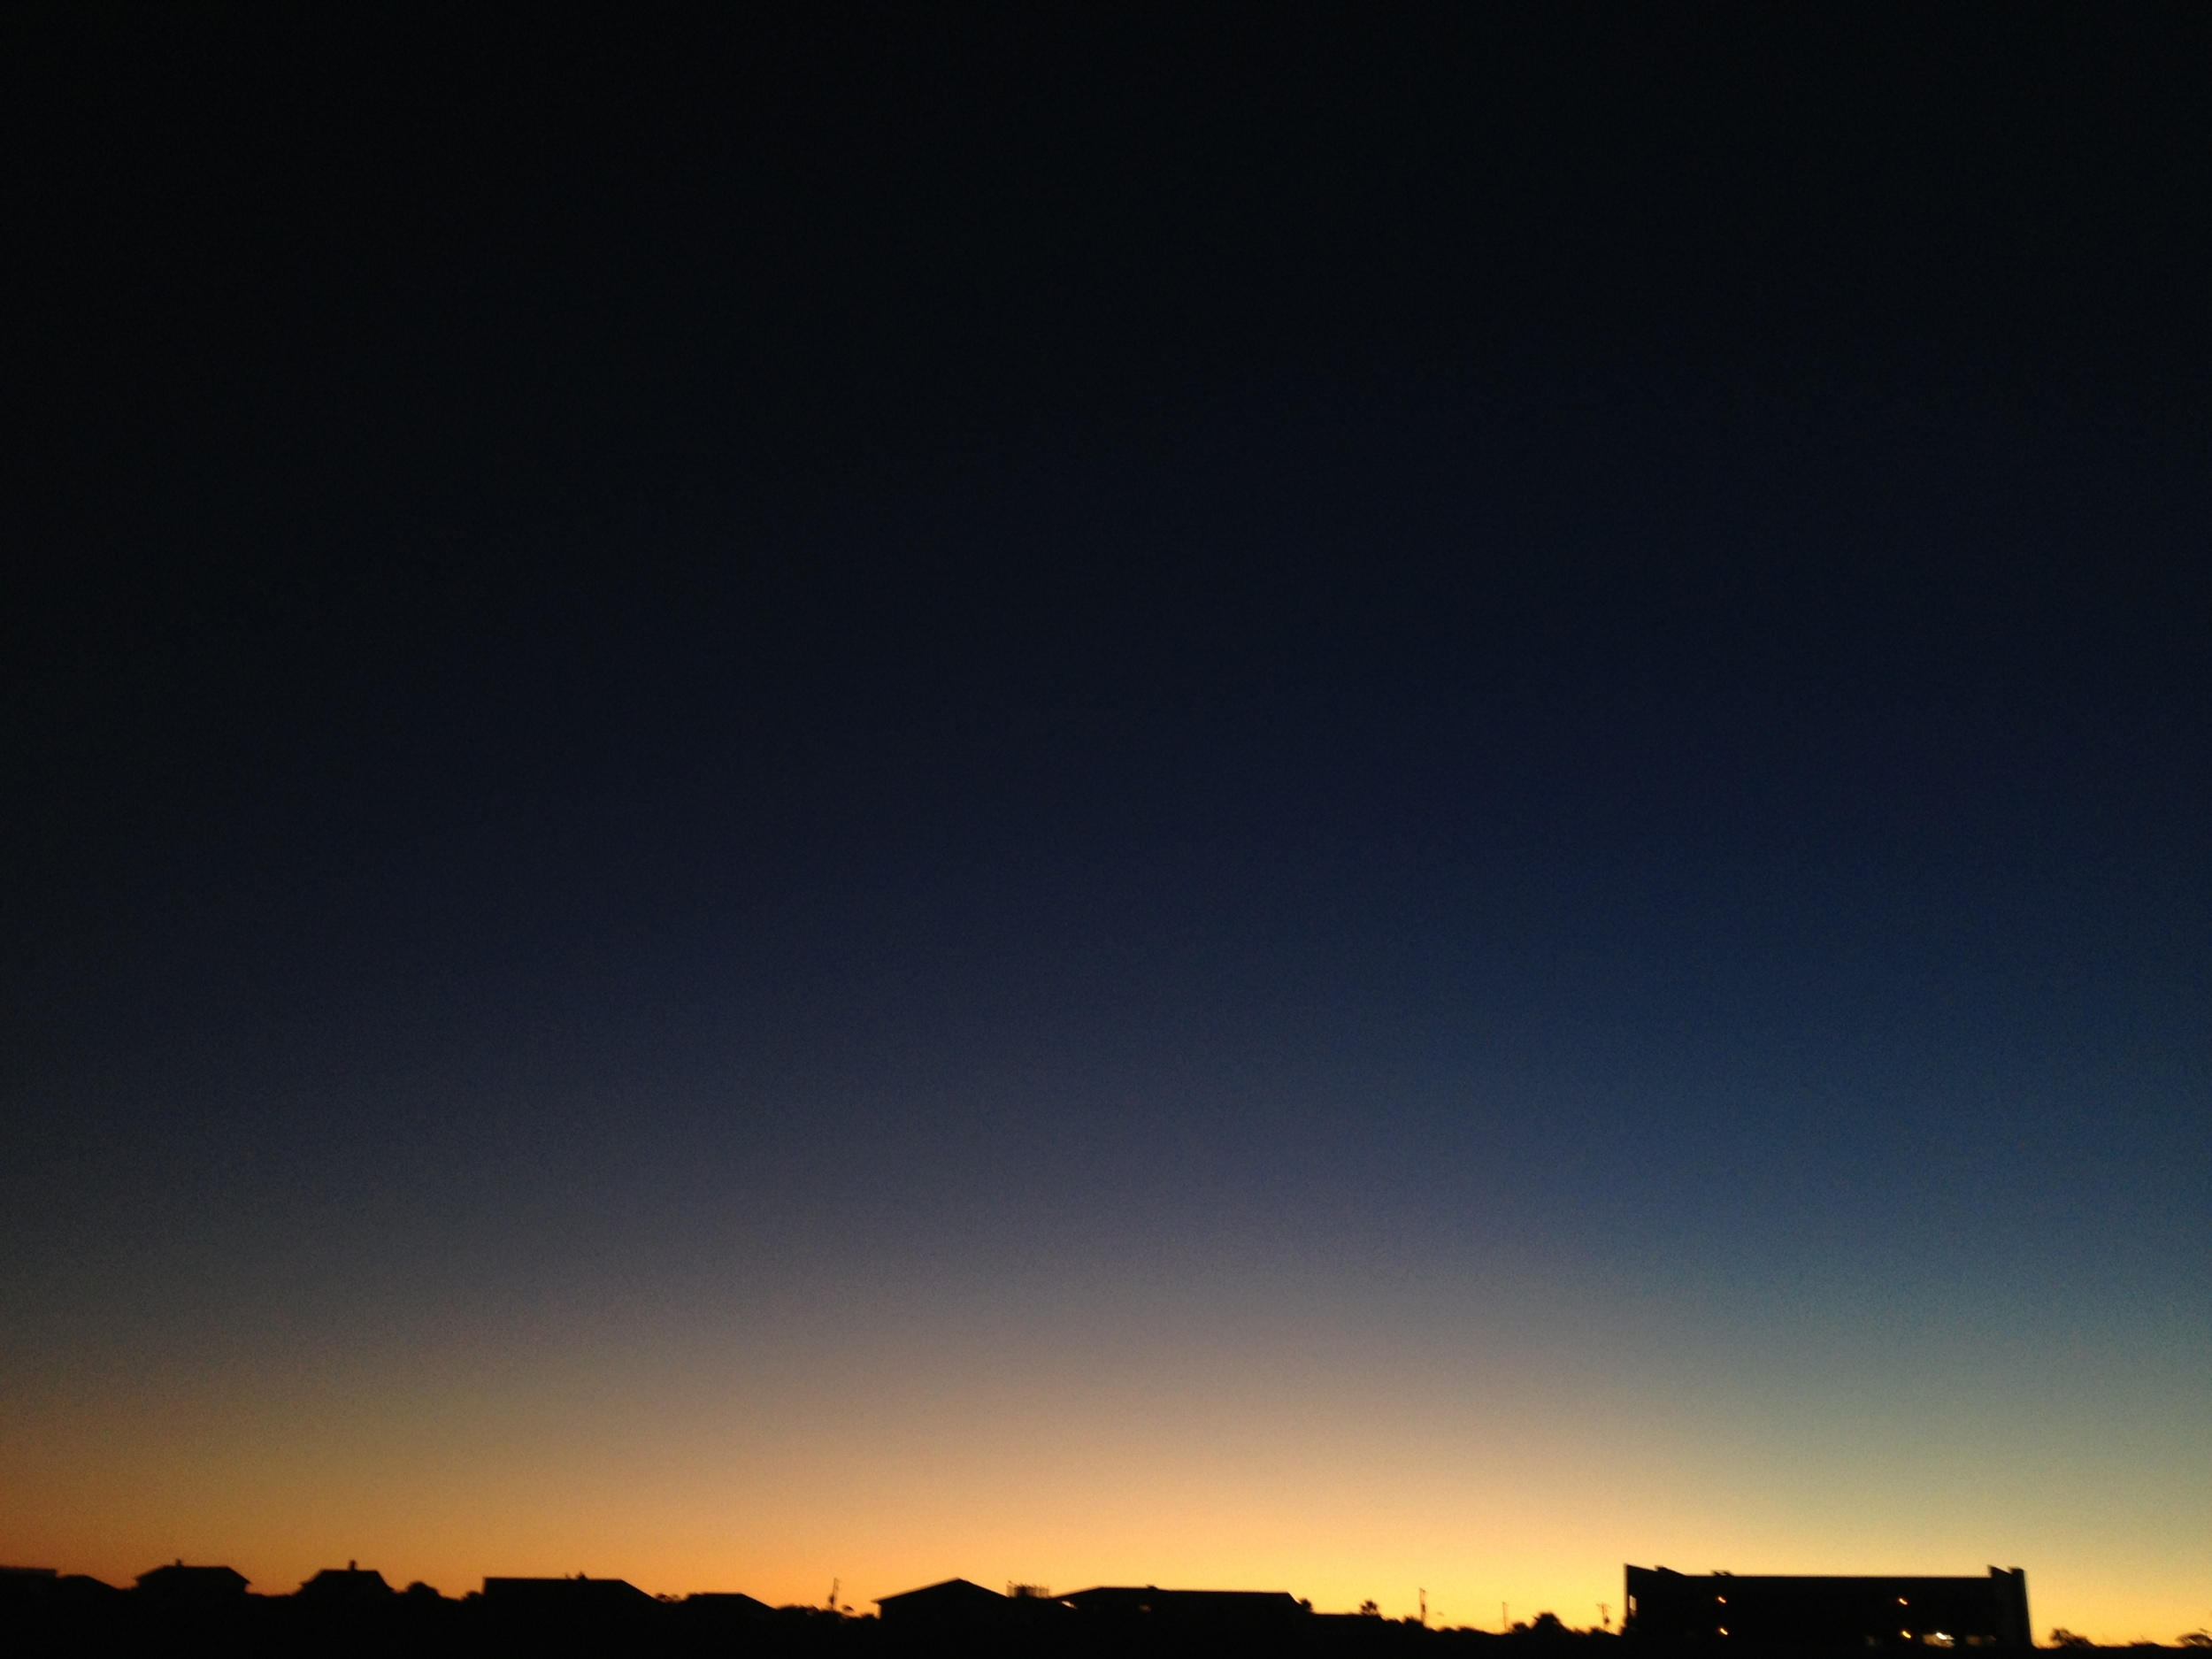 Beach dusk -October 21 2012, St. Augustine, FL